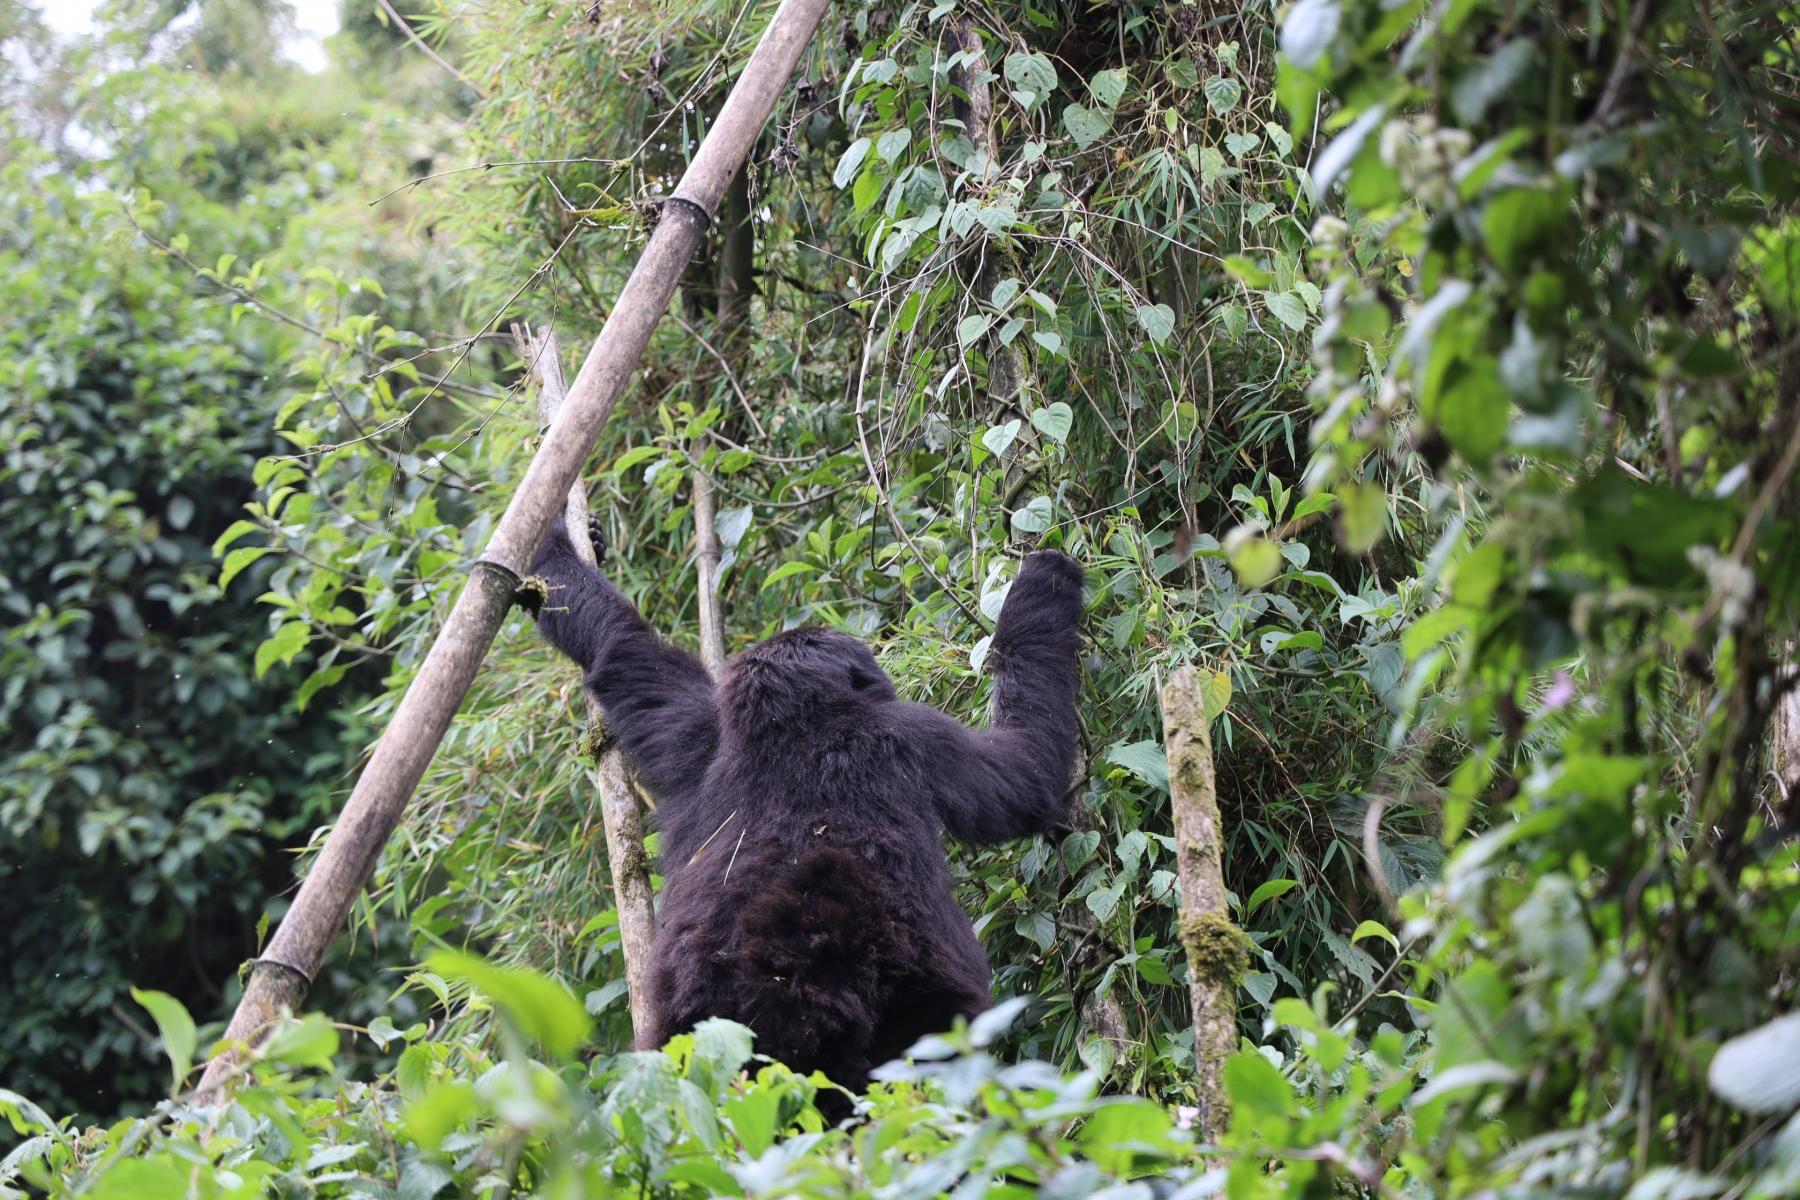 Rwanda-Gorilla-Trekking-Photo-Credit-Kate-Webster-140